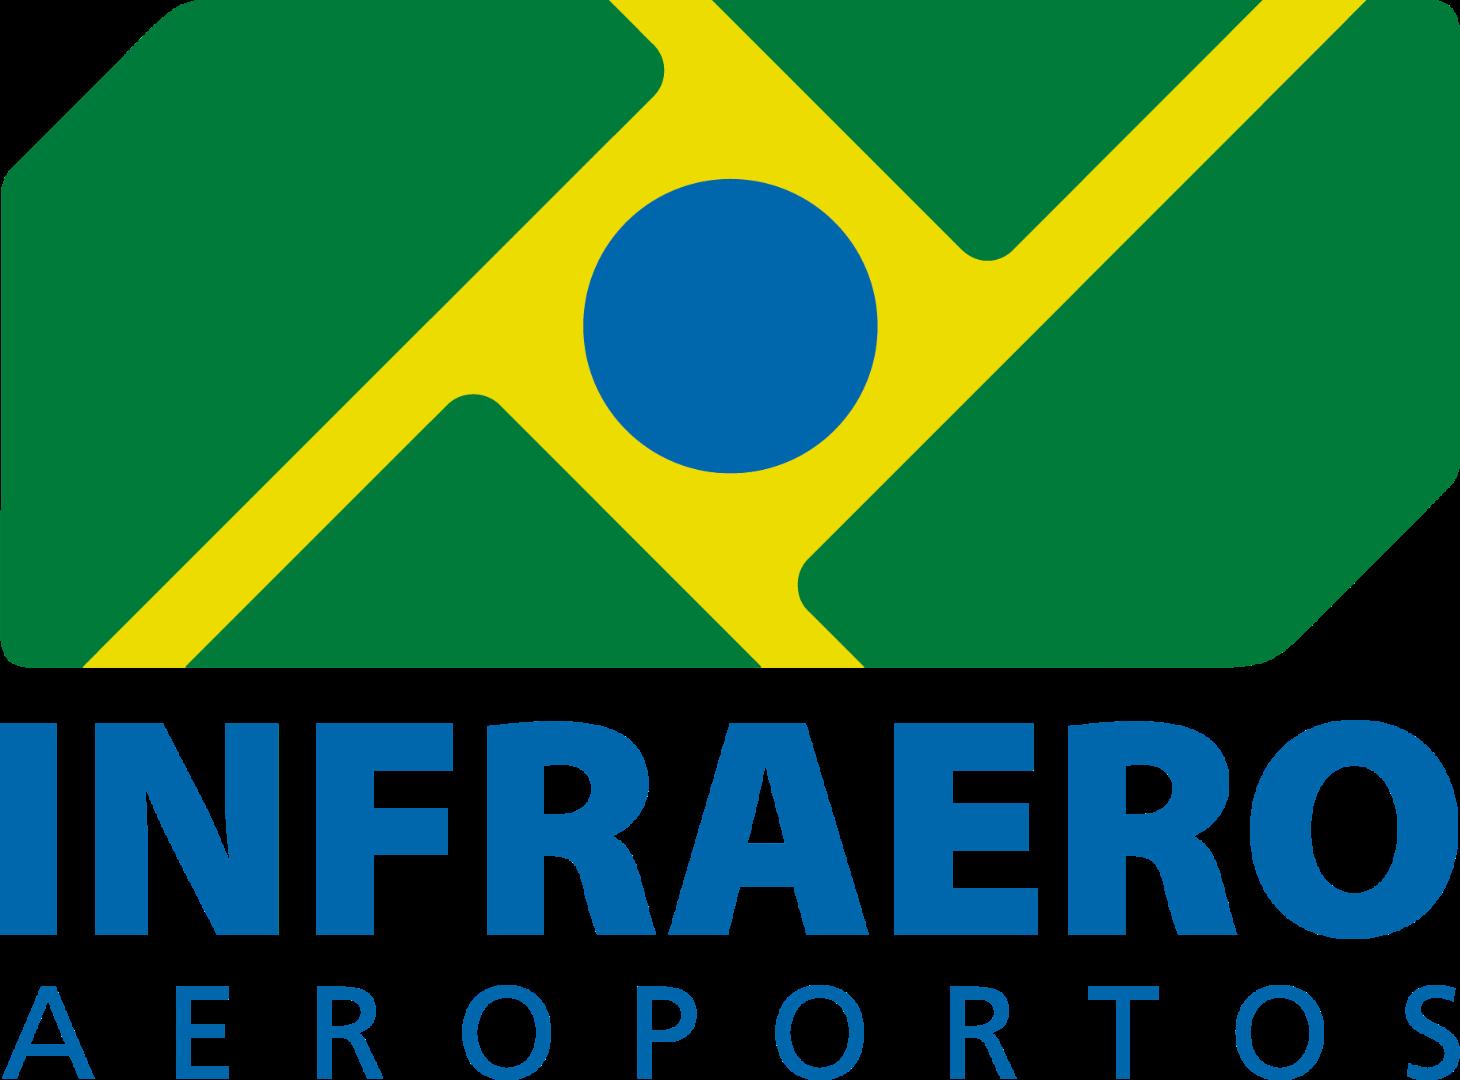 Infraero_Isologotype